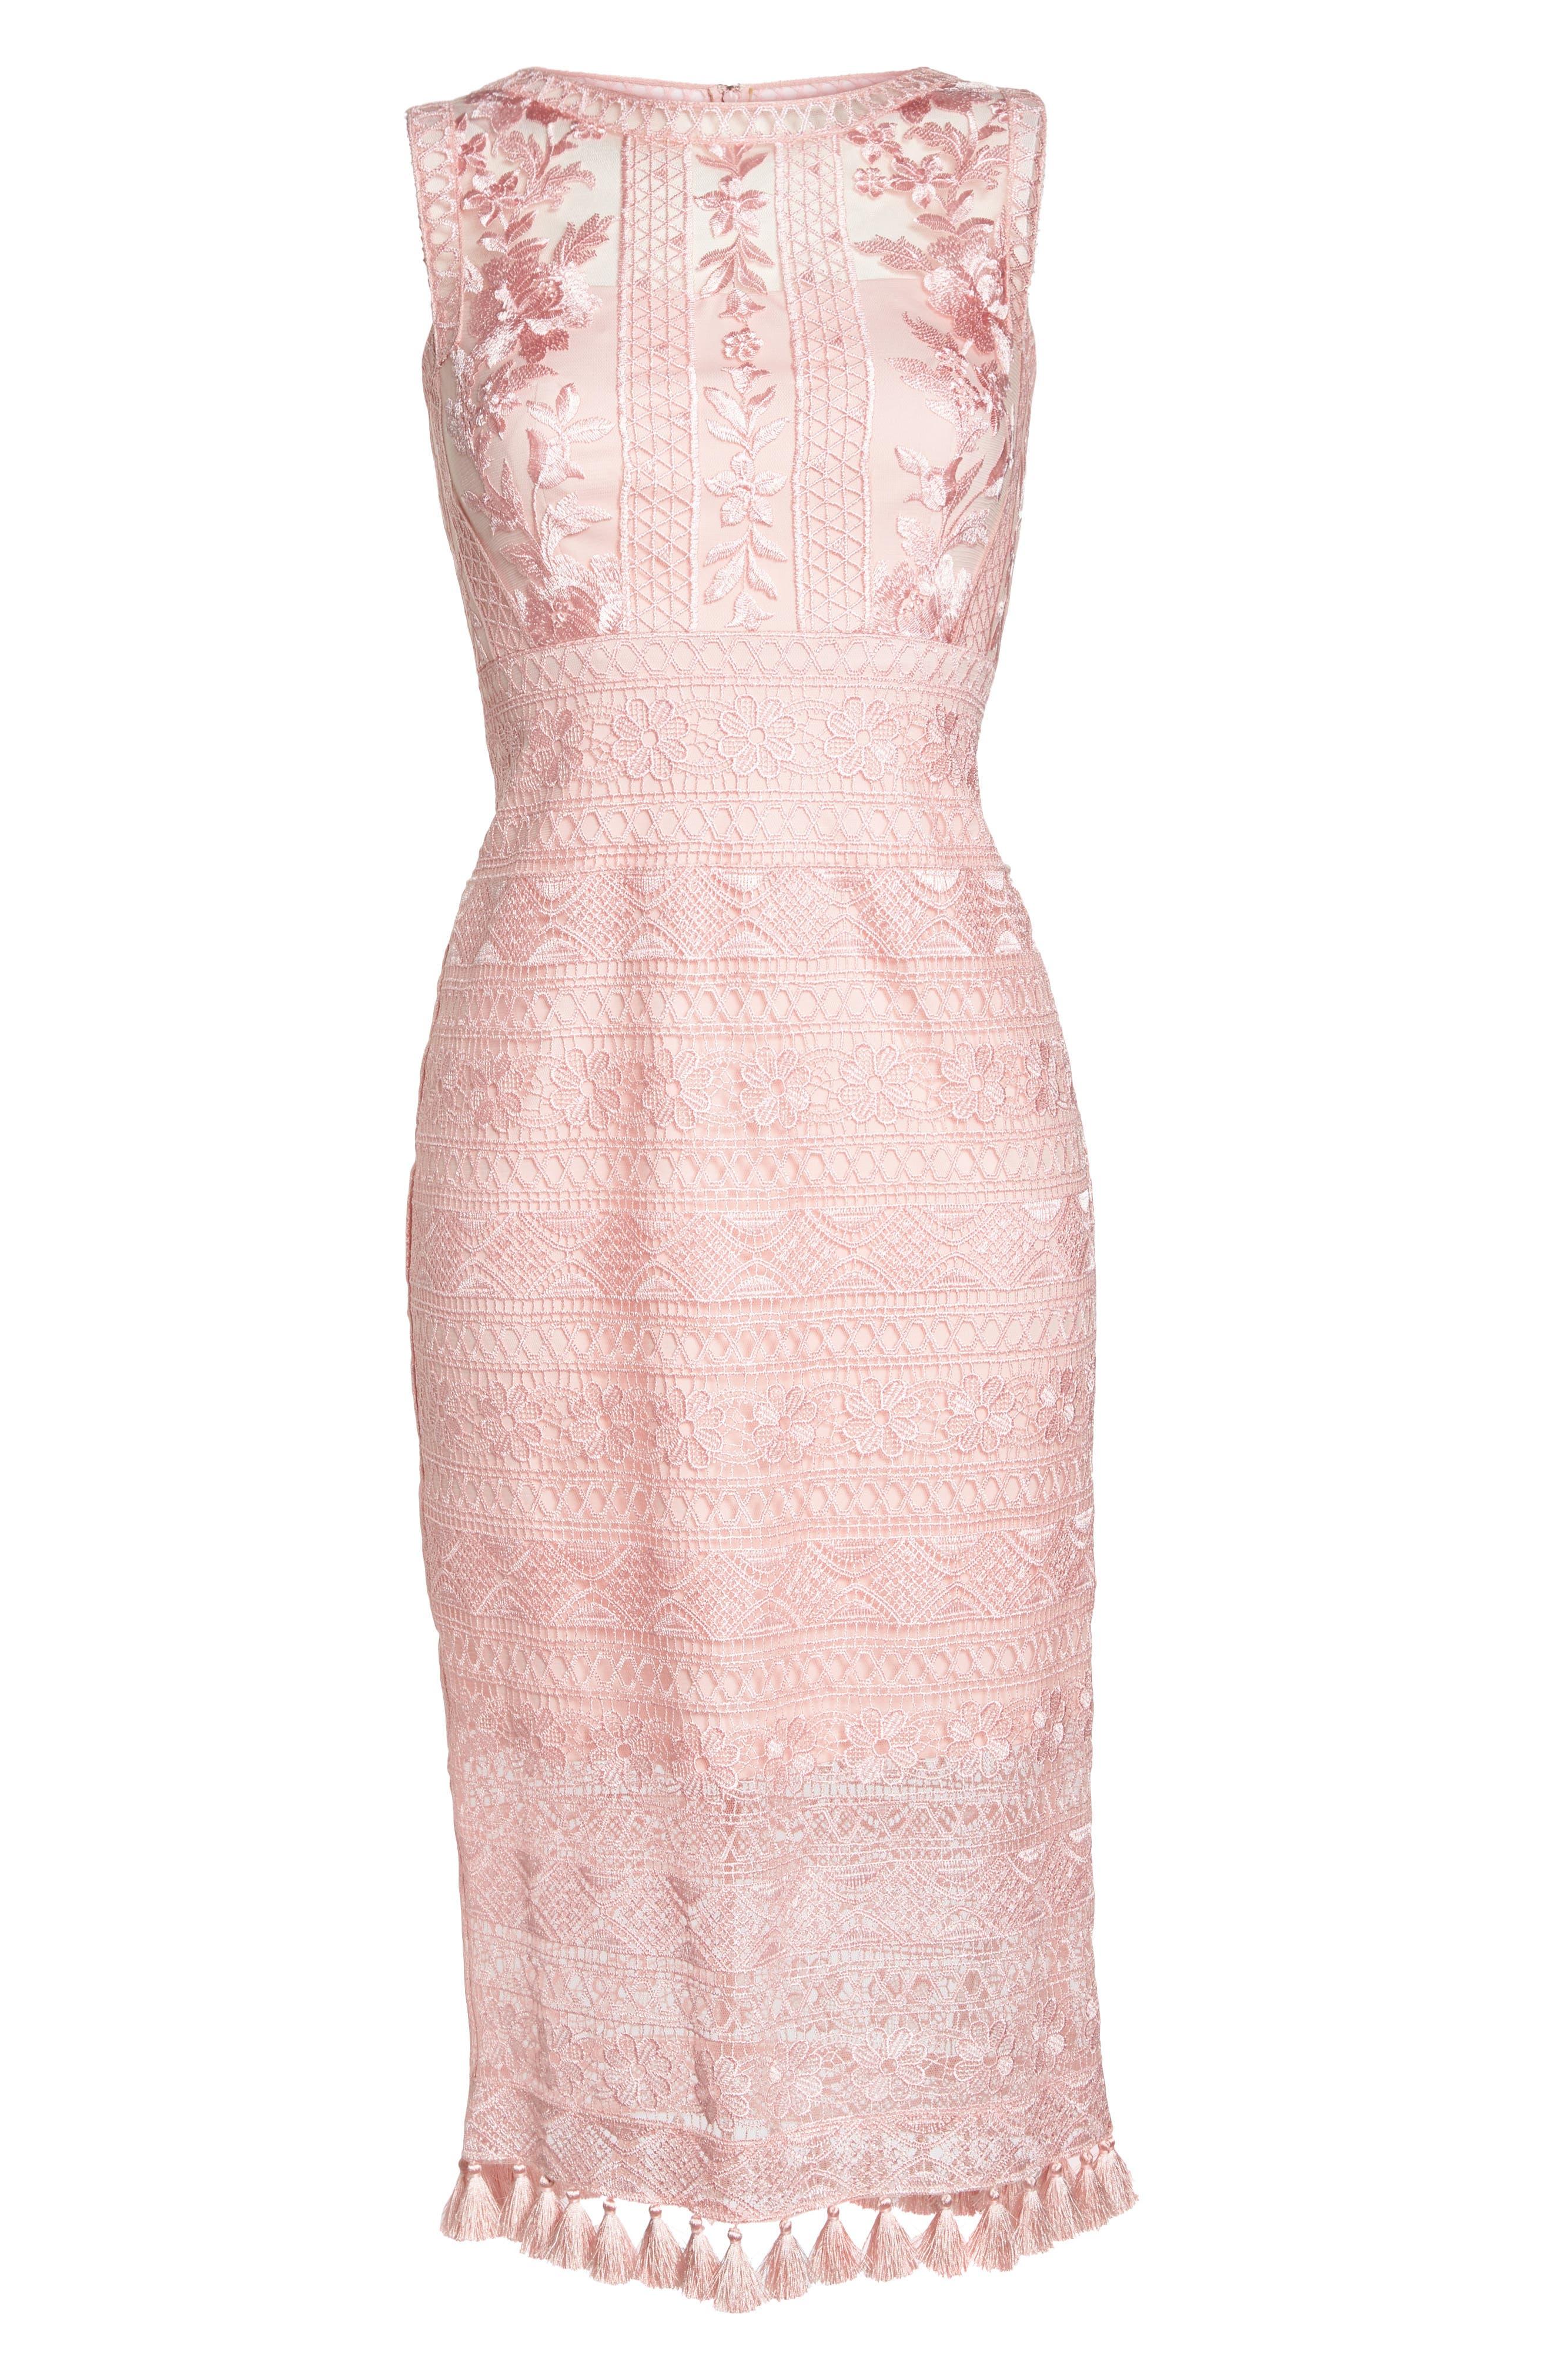 Embroidered Lace Sheath Dress,                             Alternate thumbnail 6, color,                             ROSE QUARTZ